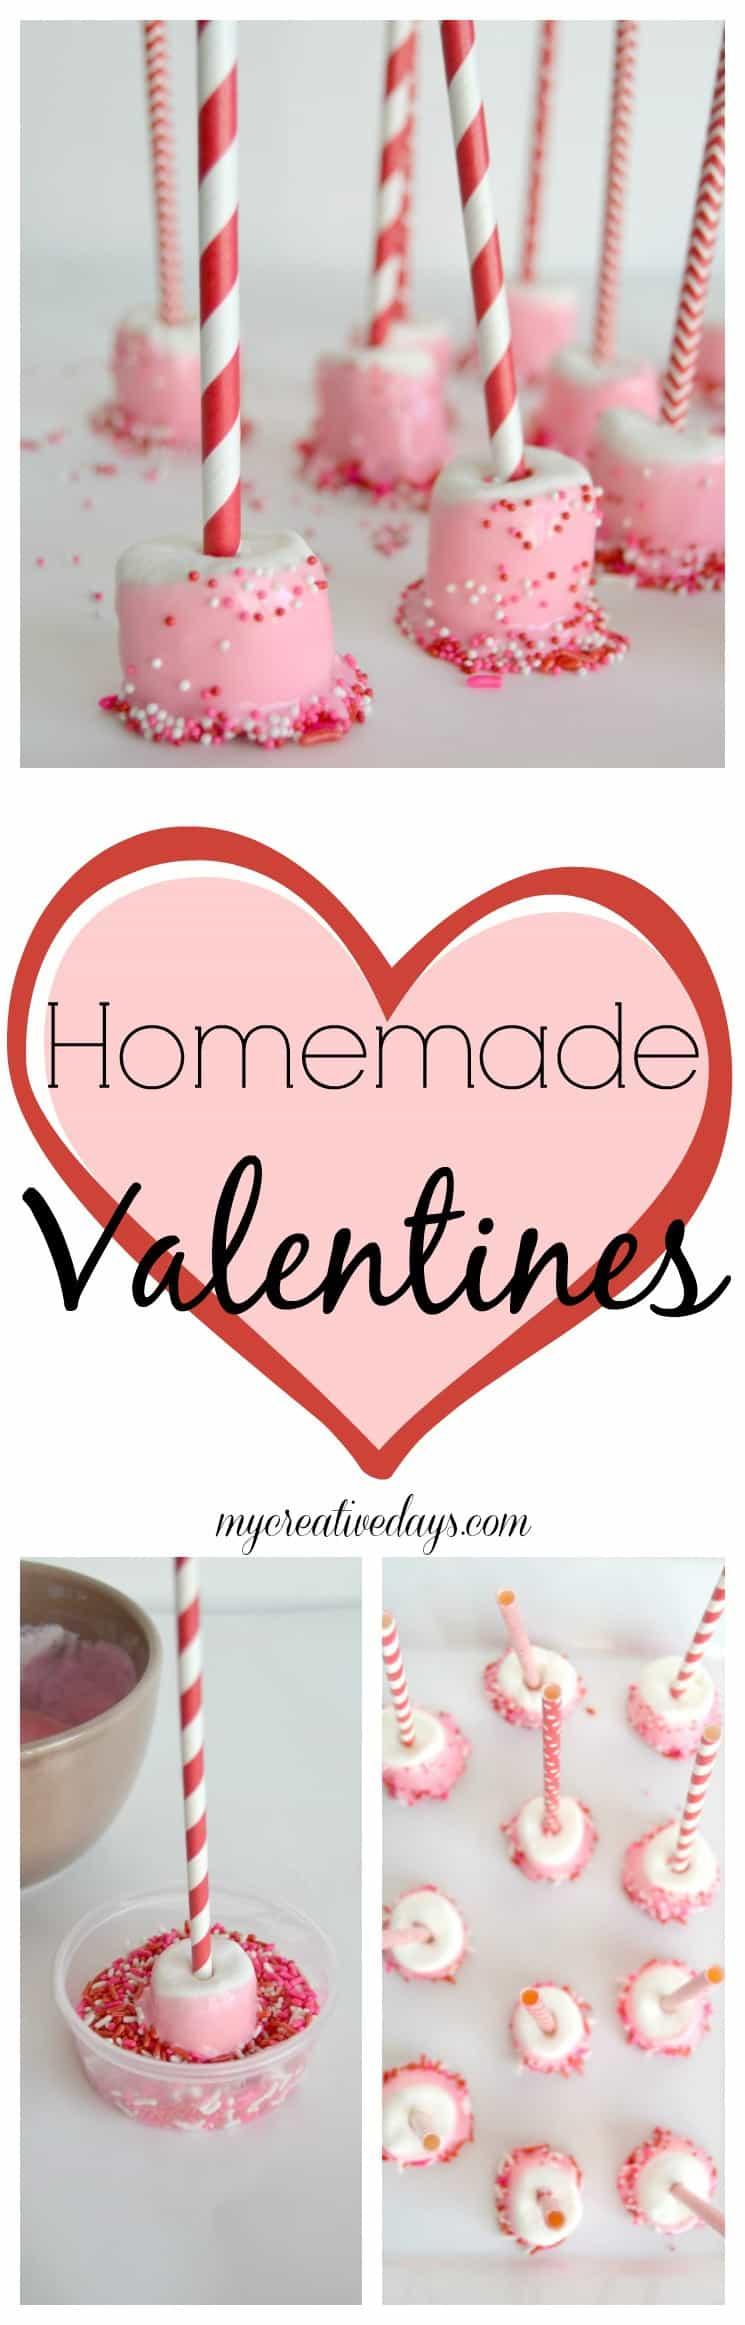 Homemade Valentines Marshmallow Treat Gifts My Creative